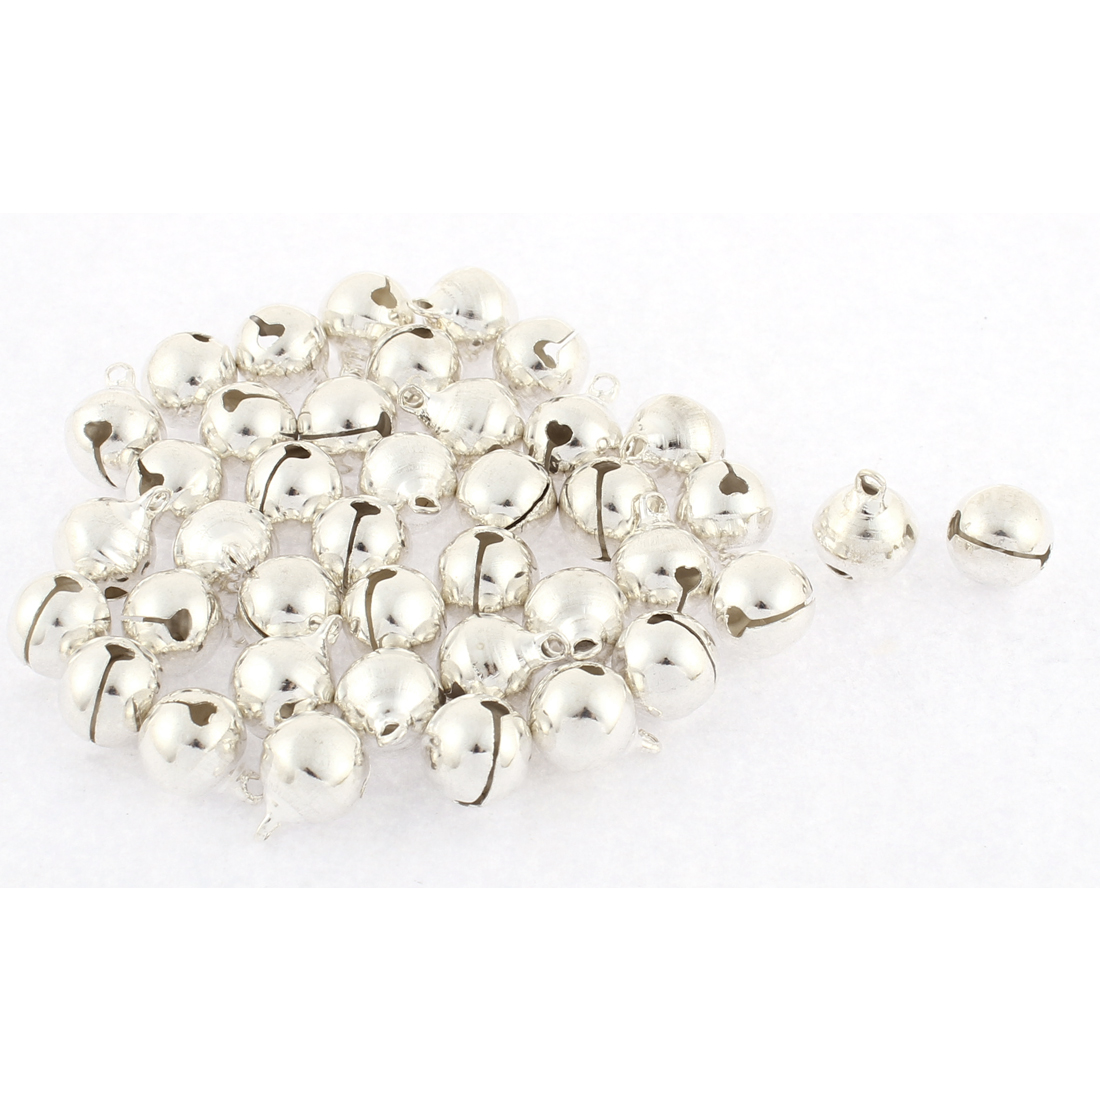 40pcs 12mm Dia Metal Party Christmas Tree Decor Ring Jingle Bells Ornaments Adorned Silver Tone